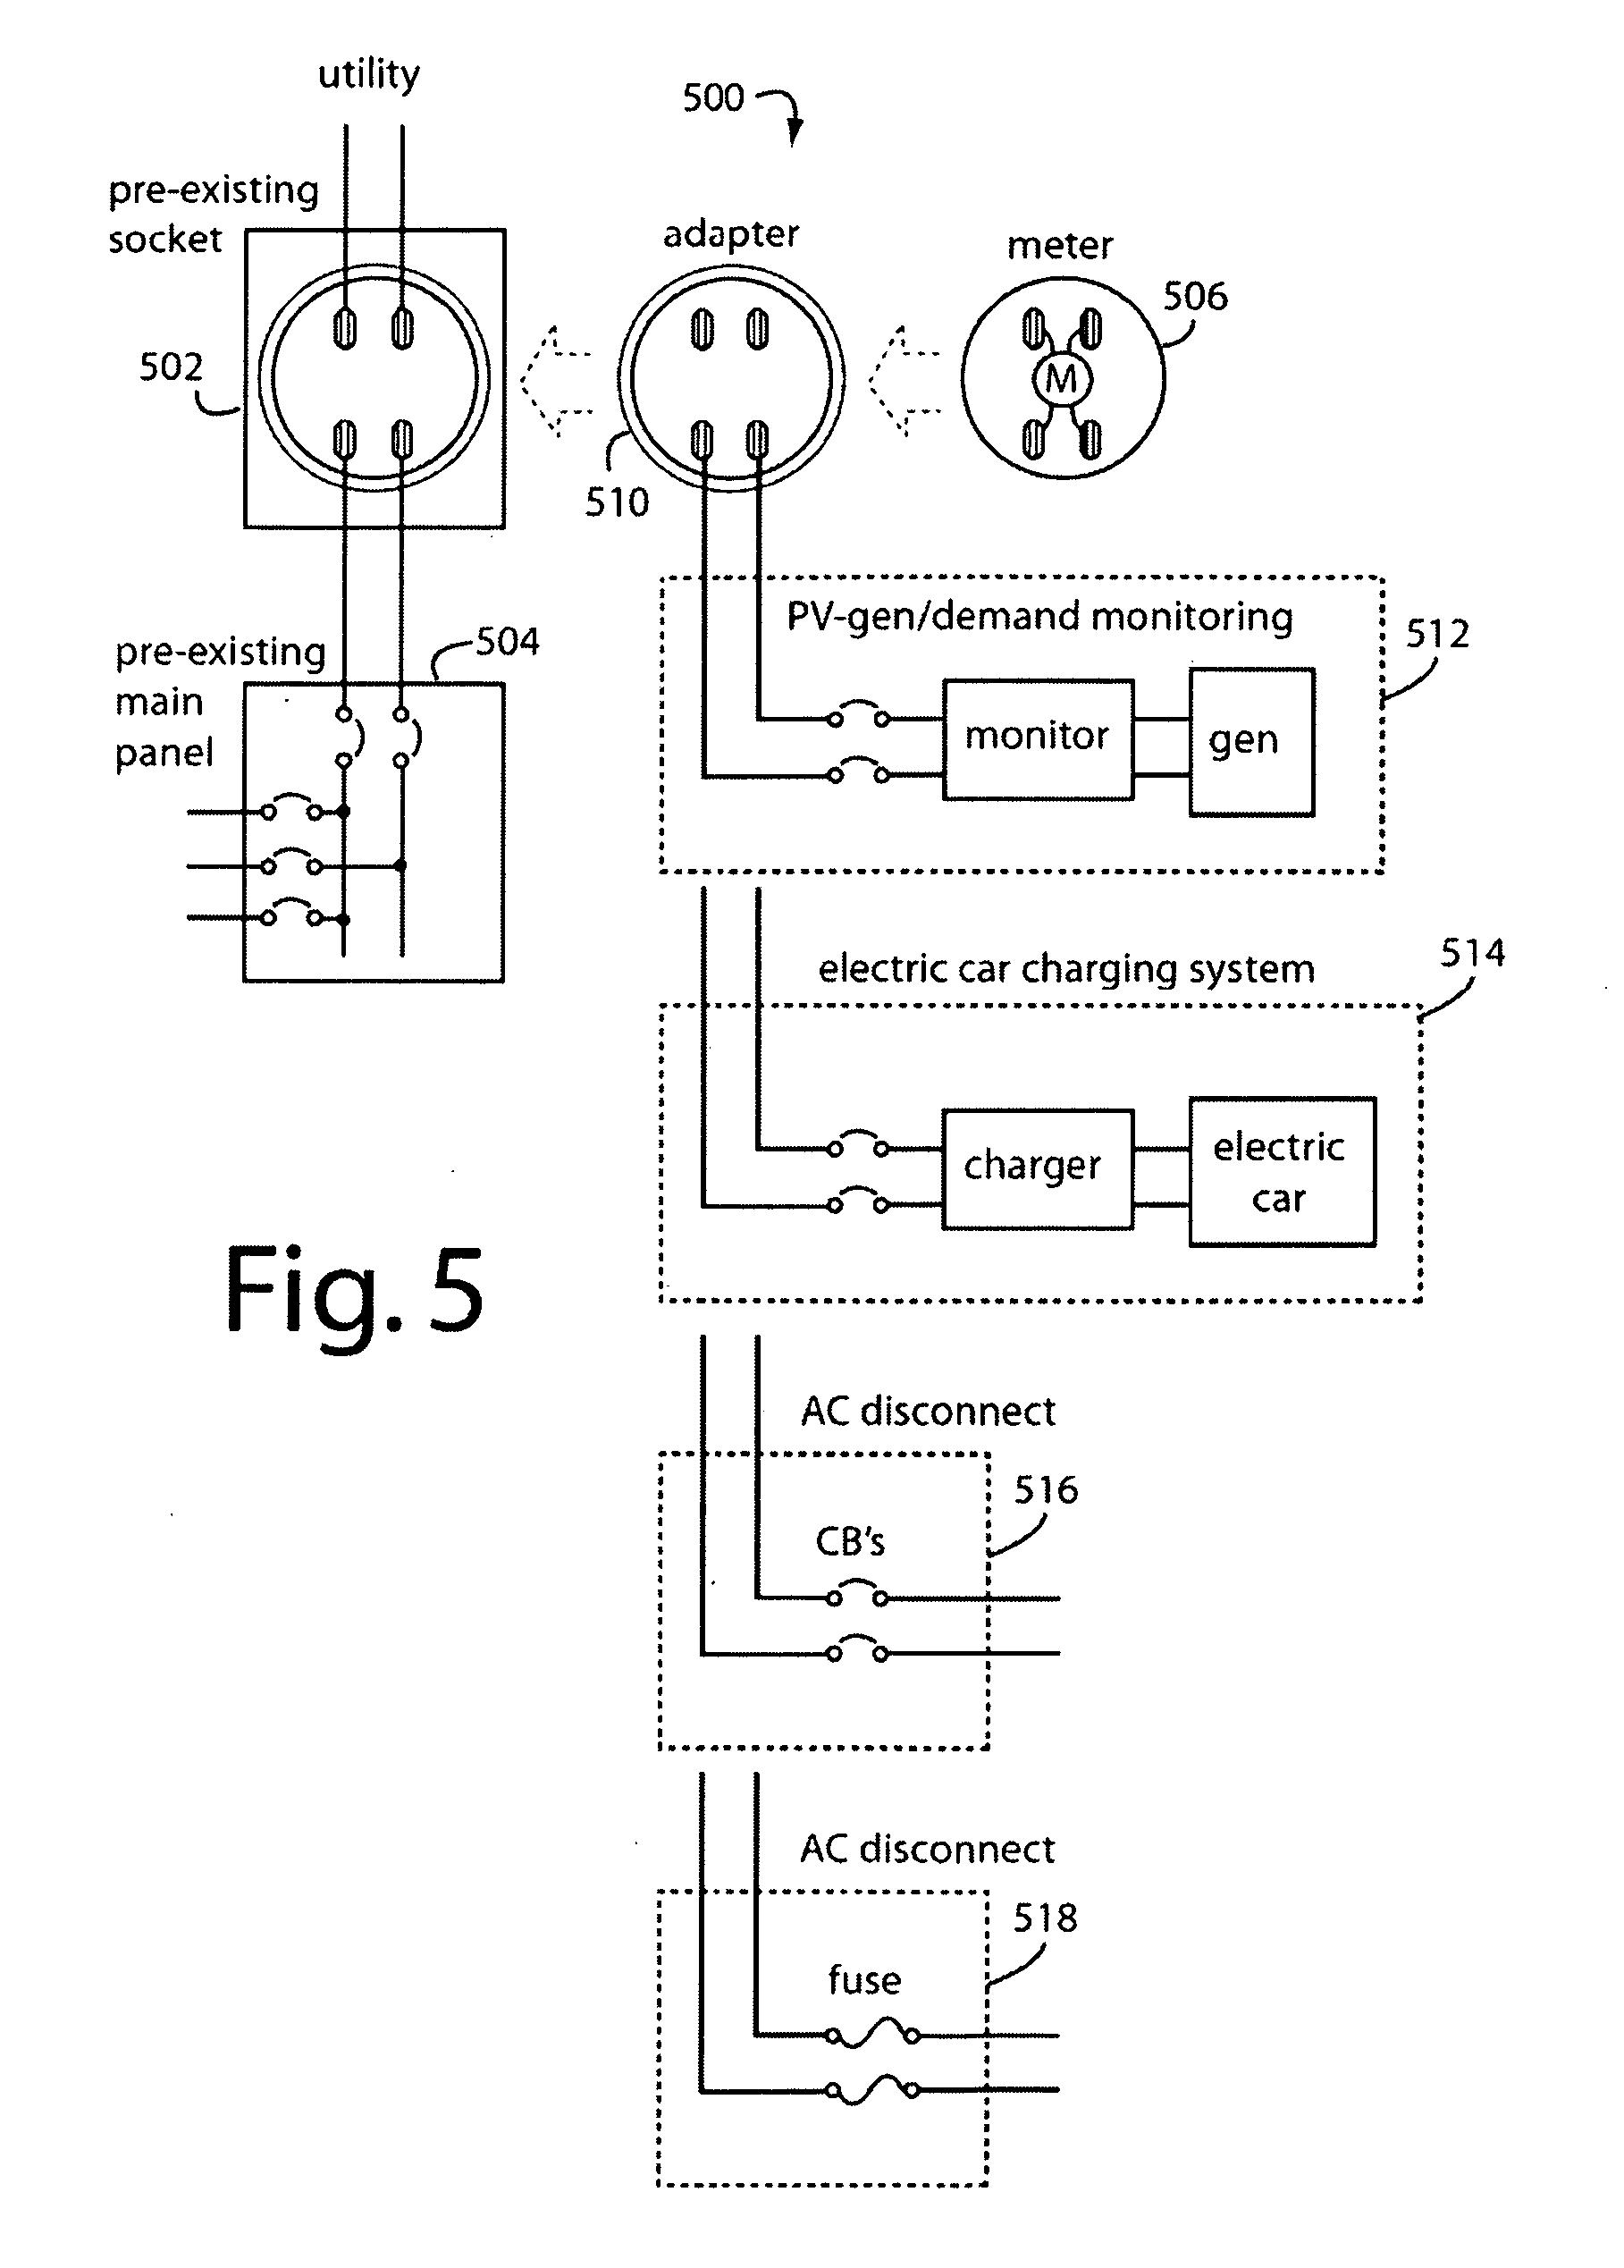 kilowatt hour meter wiring diagram 2000 pontiac grand am 9s watt water heater